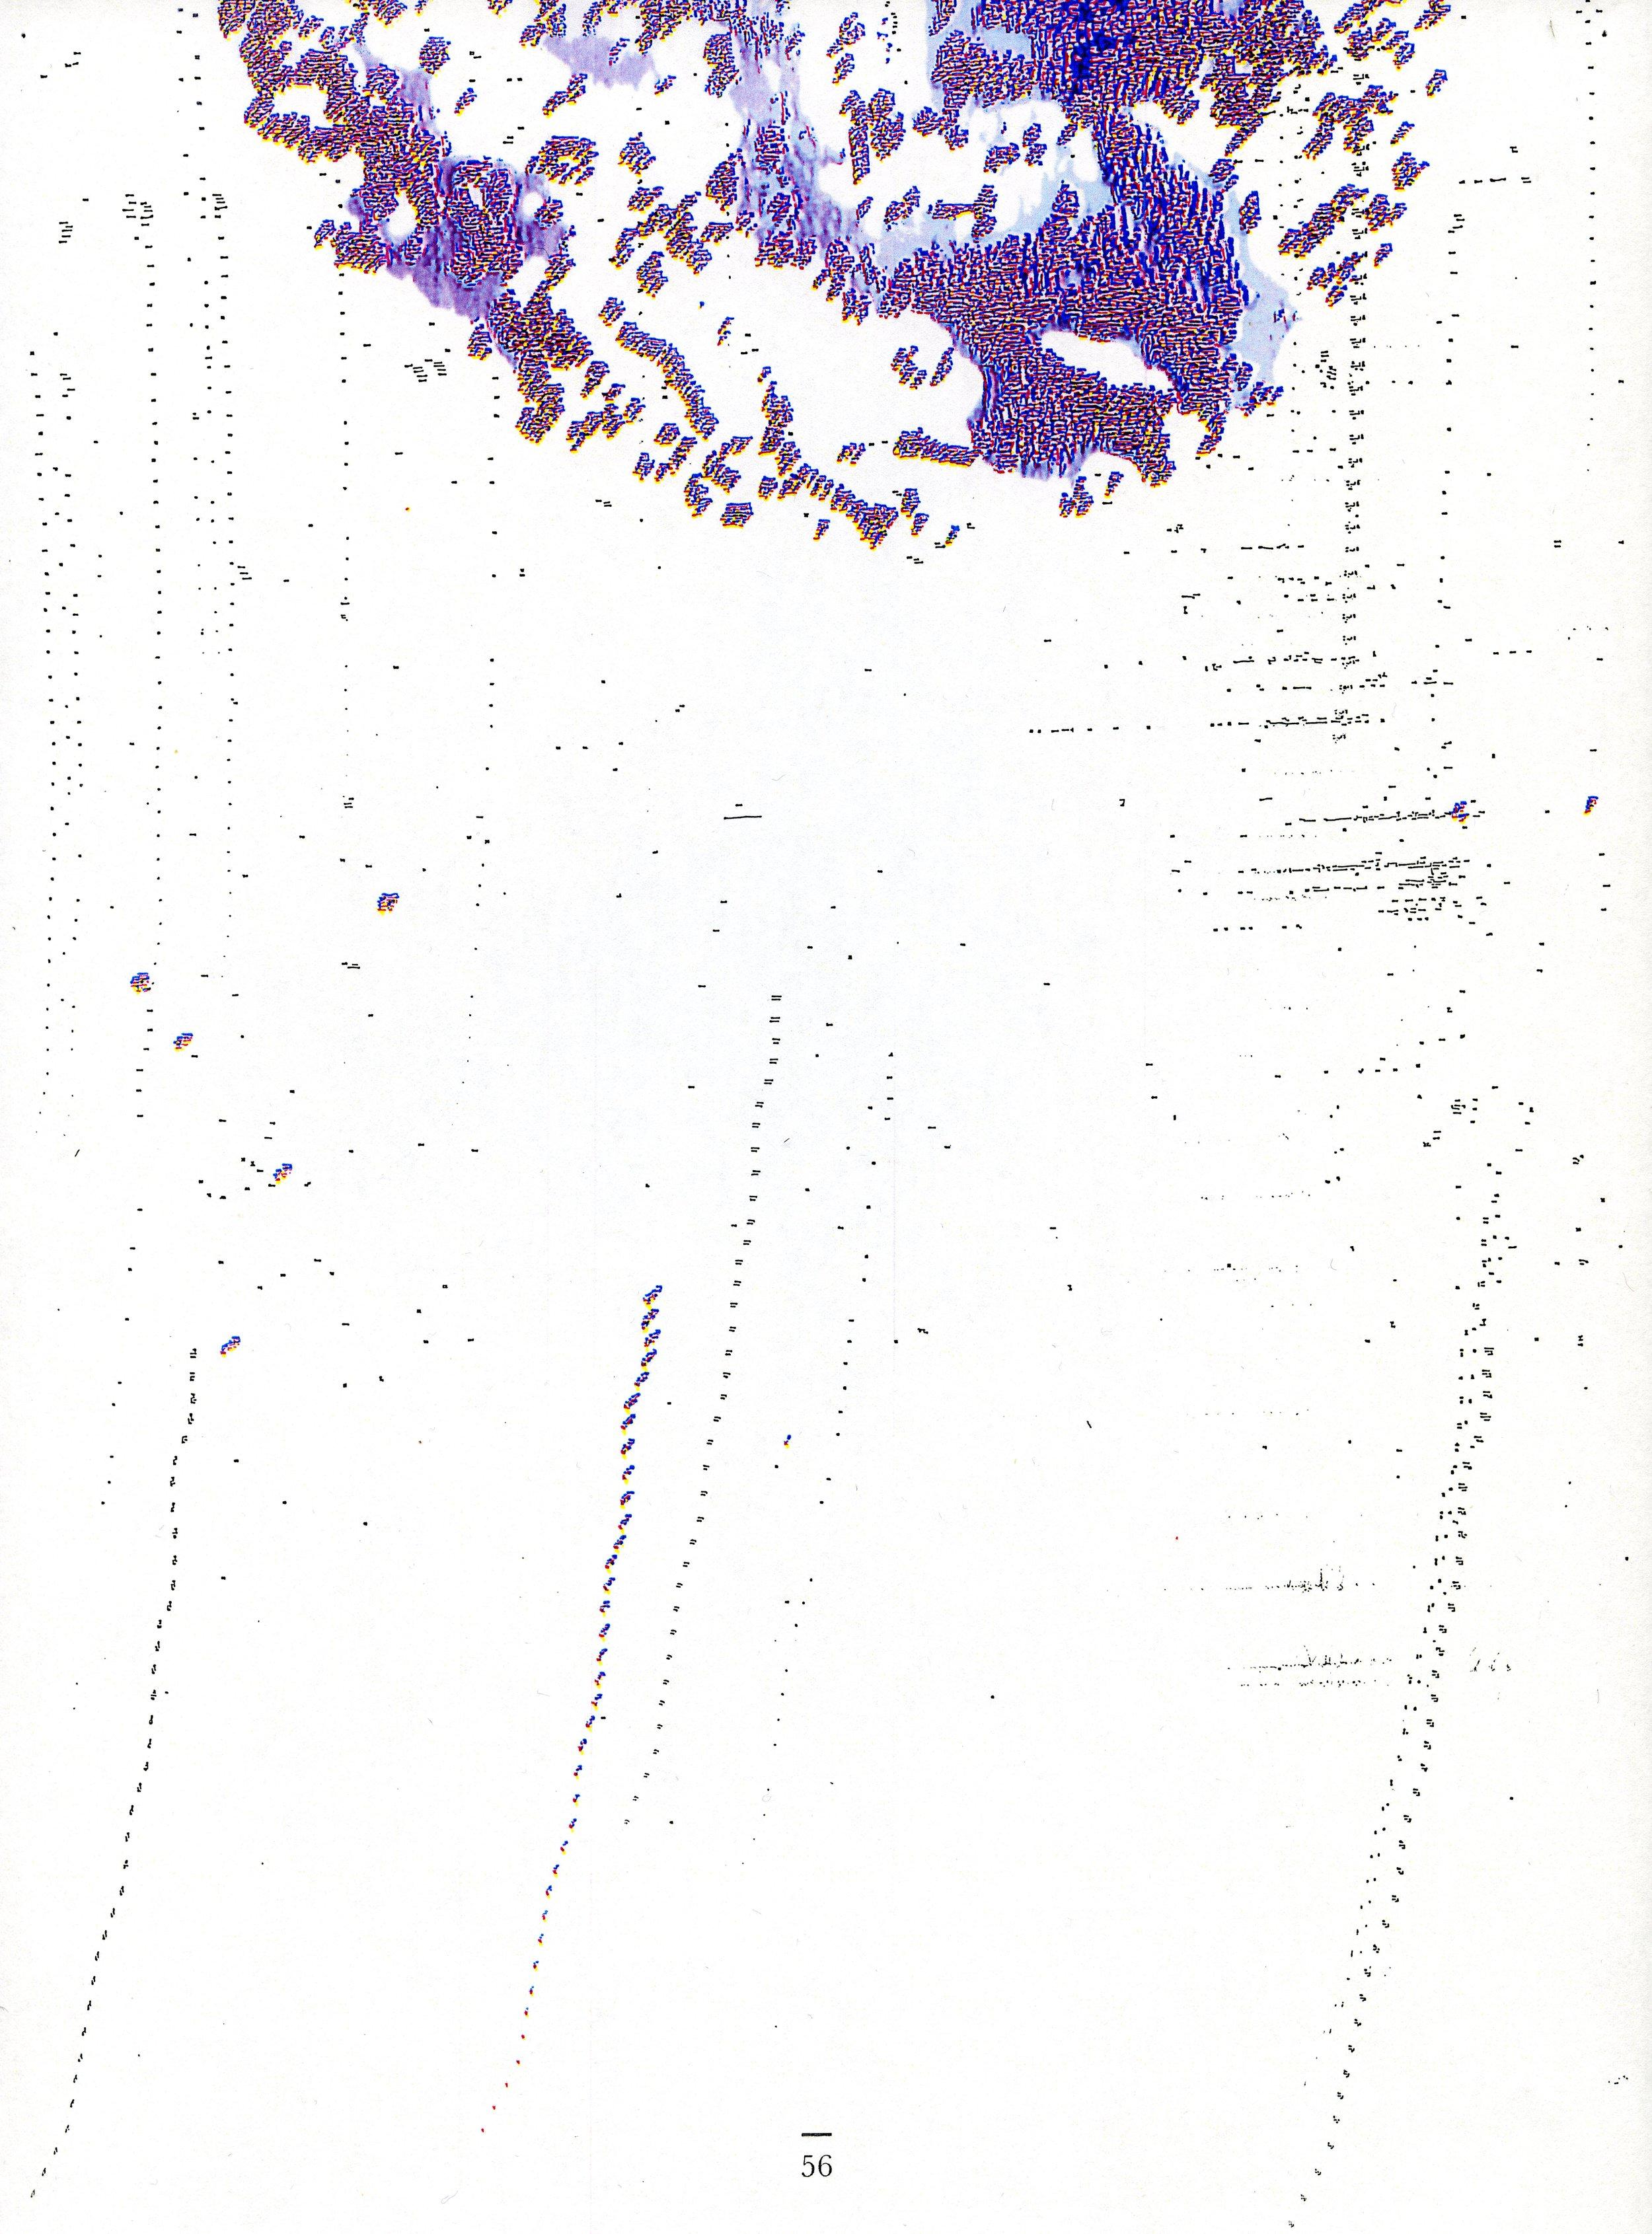 Maakbaarheid013.jpg